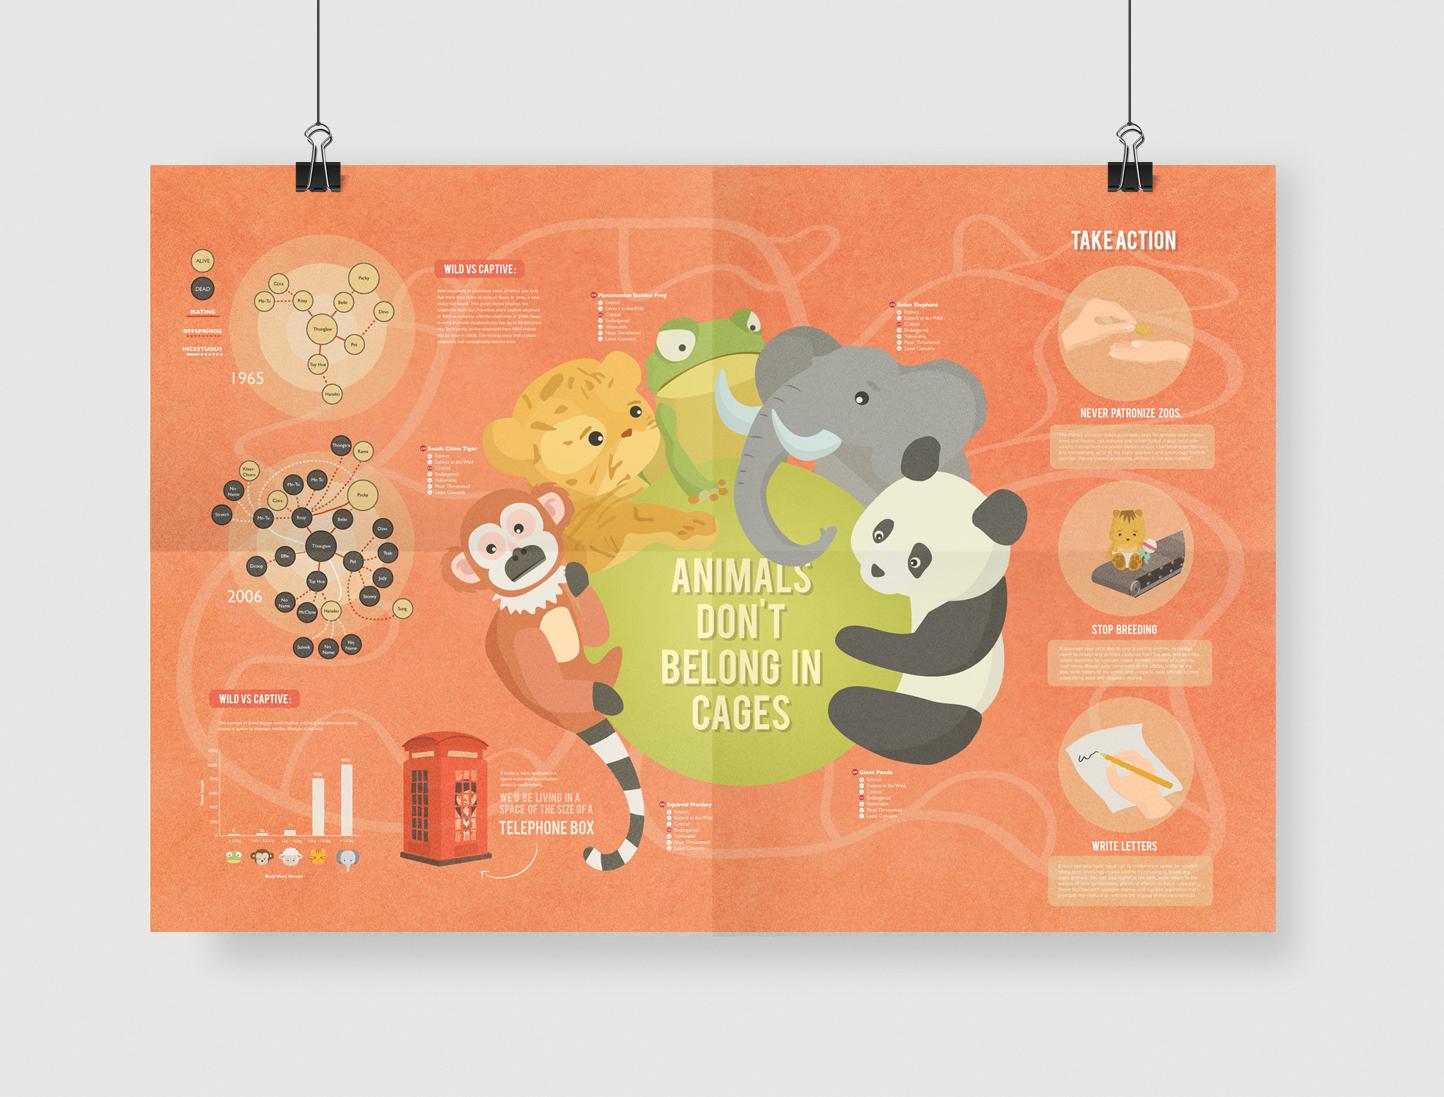 zoo-mockup-poster.jpg